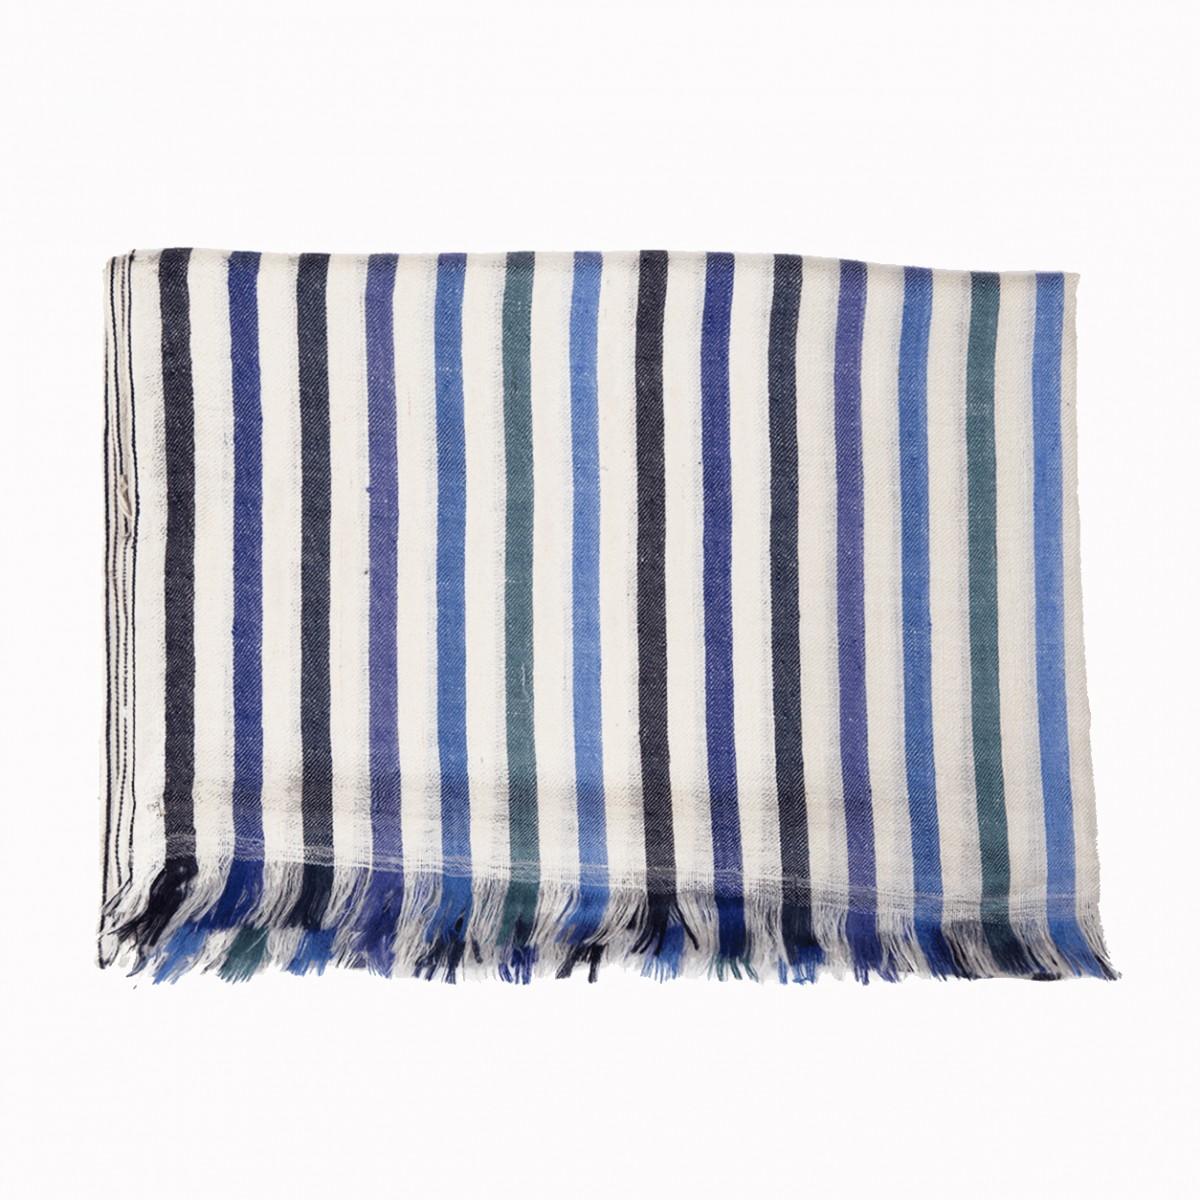 Opera warp stripes ivory and blue pashmina stole